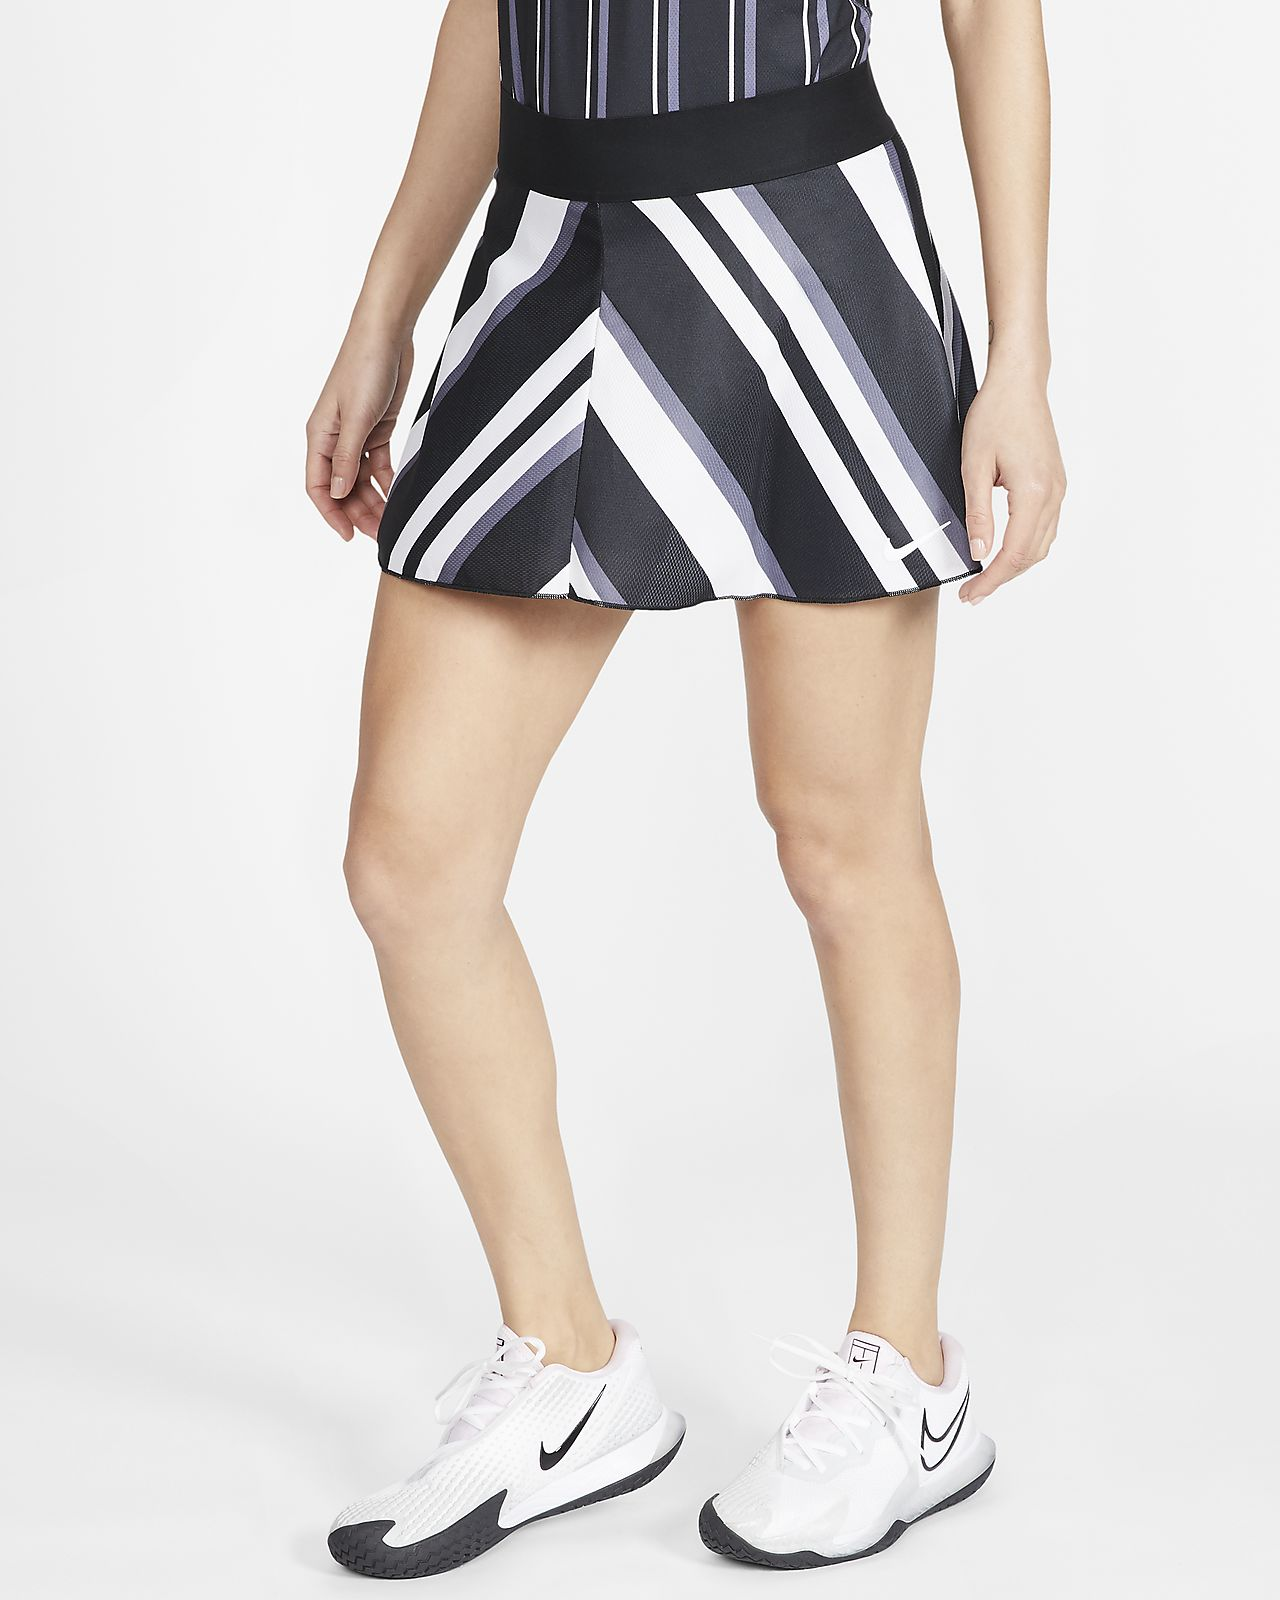 NikeCourt Dri FIT Women's Printed Tennis Skirt